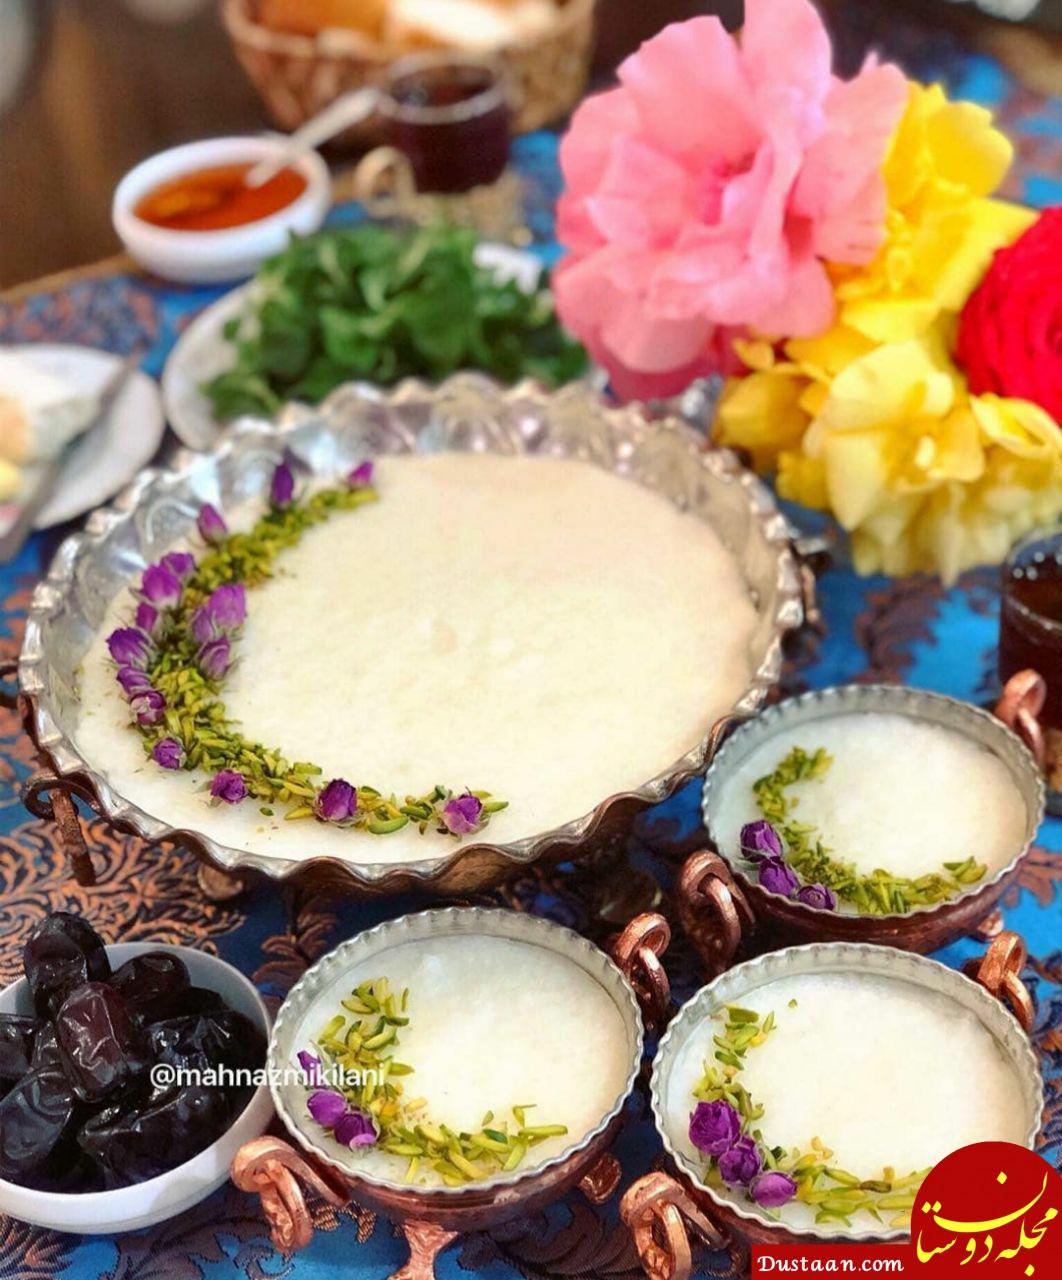 www.dustaan.com طرز تهیه شير برنج مخصوص ماه رمضان ، خوشمزه و متفاوت